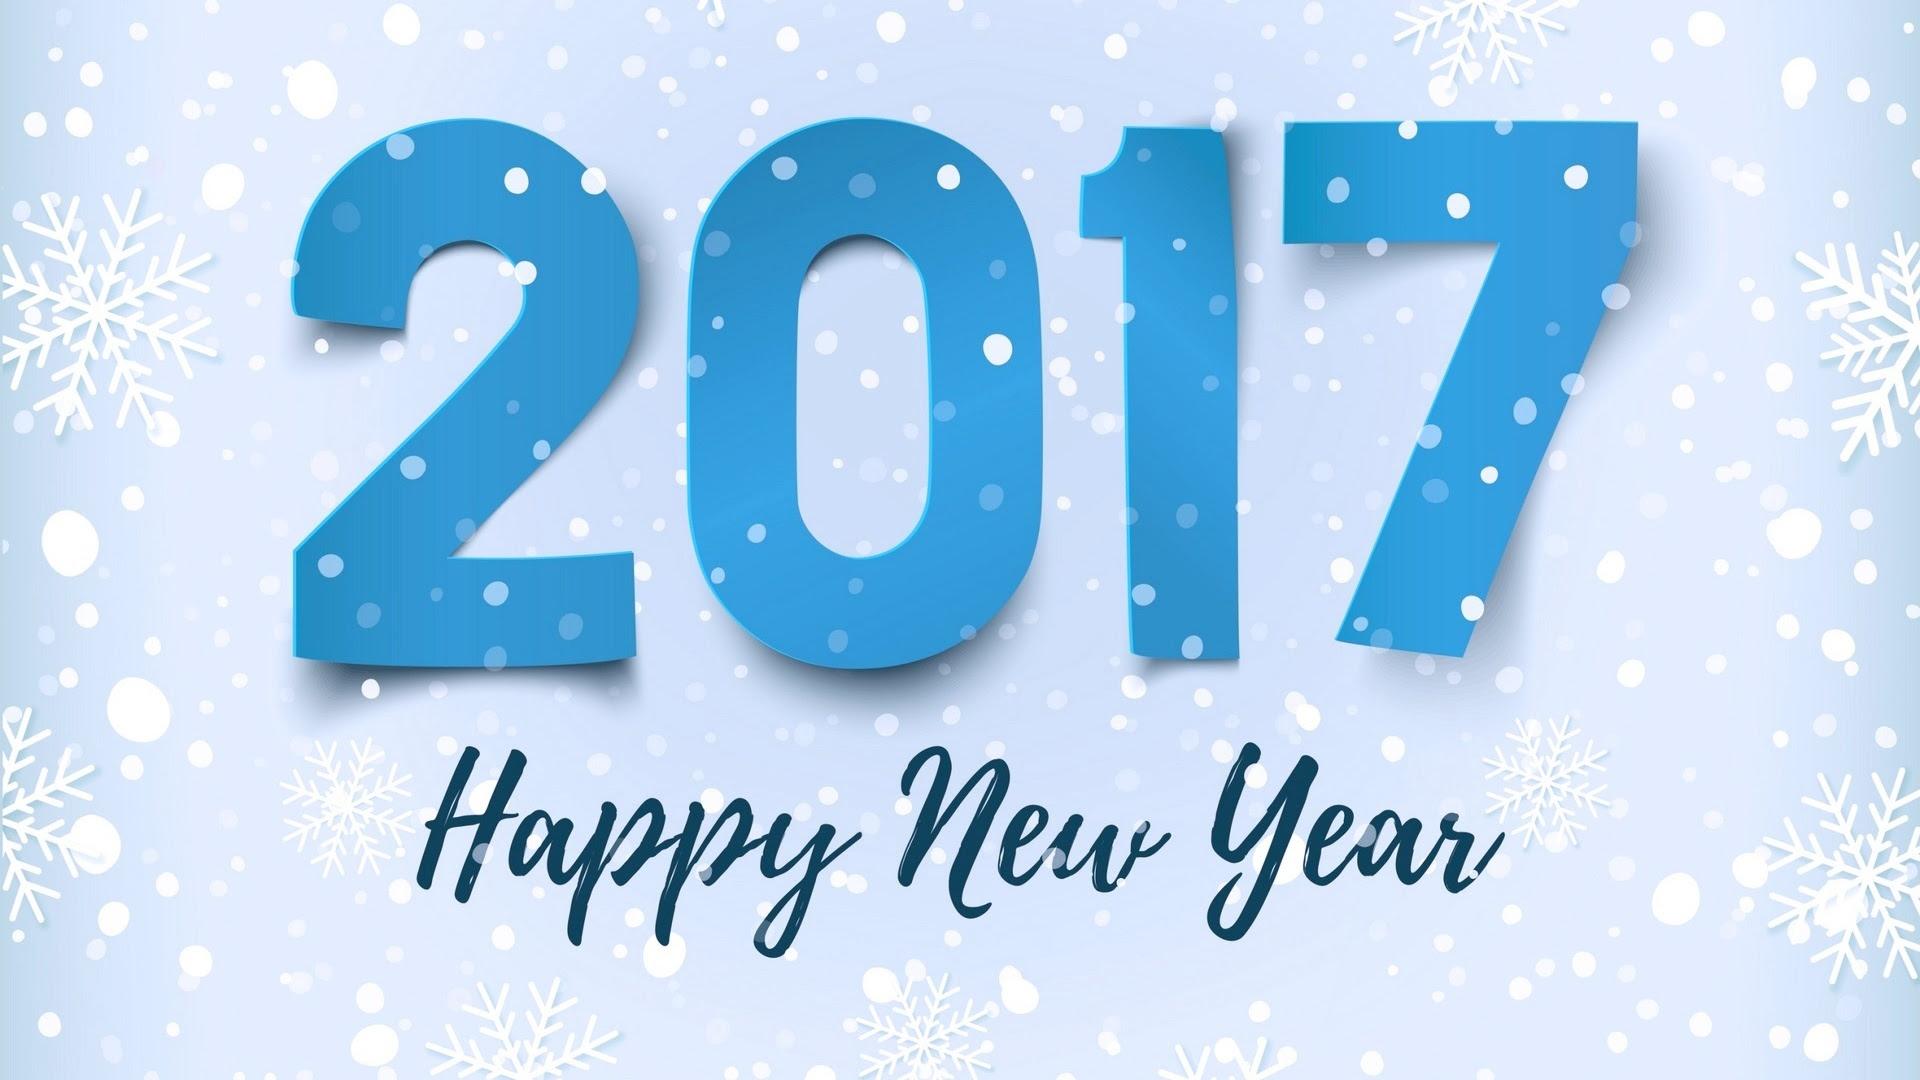 2017 Happy New Year Hd Wallpaper 11566 Baltana